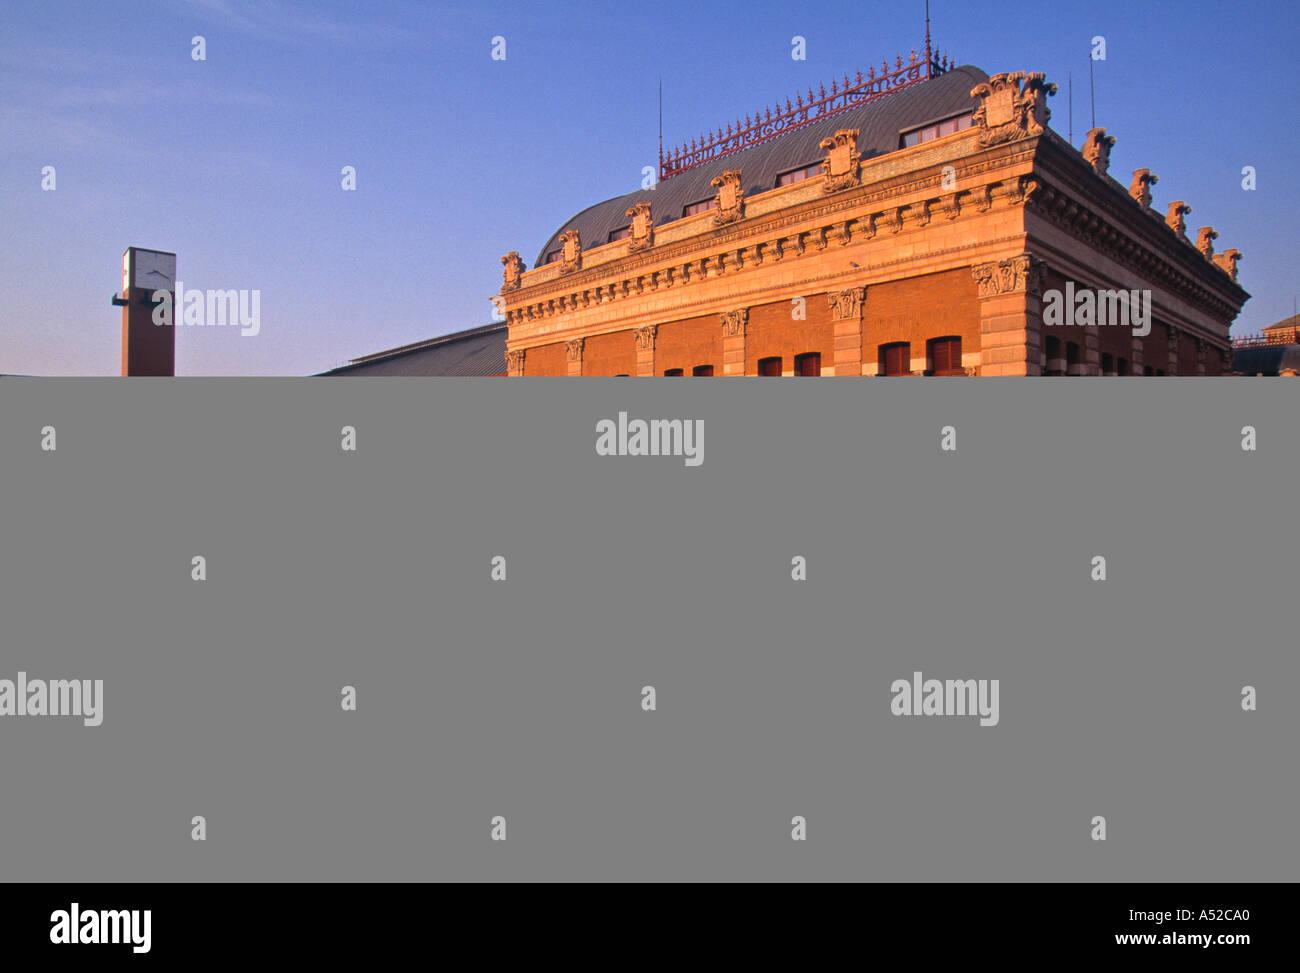 Atocha Railway Station, Madrid, Spain - Stock Image